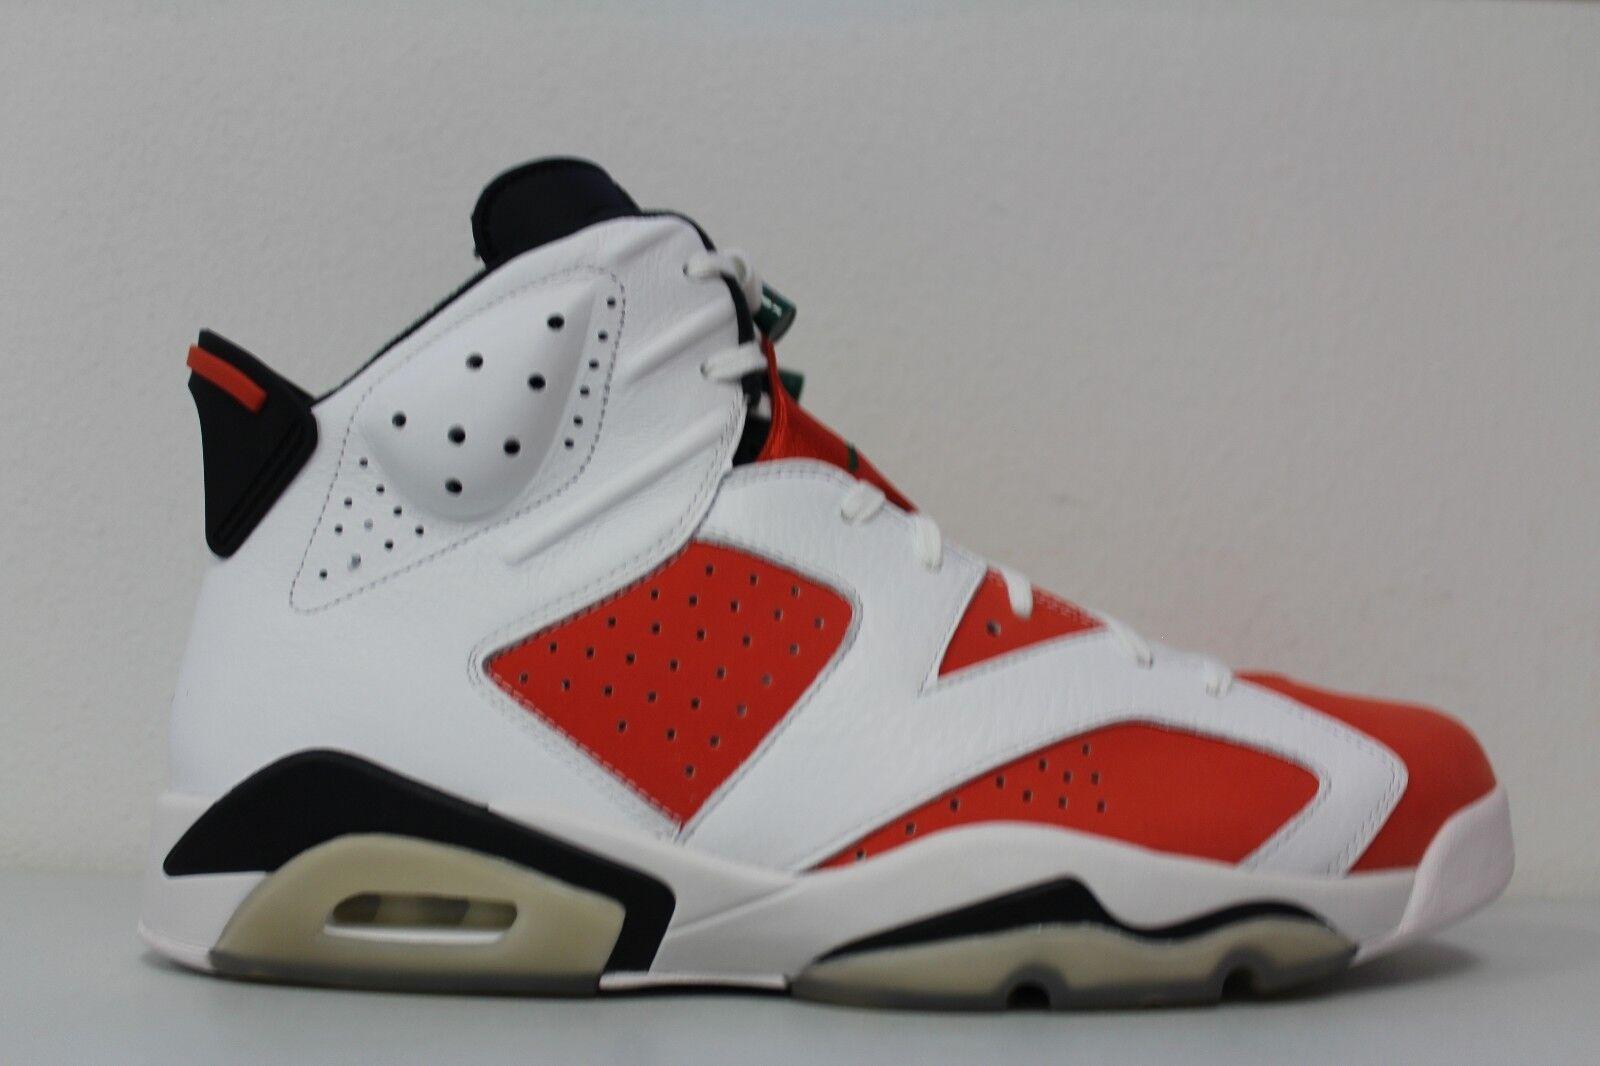 Nike air jordan 6 uomini gatorade retrò vi vertice 384664-145 arancione bianco numero 13